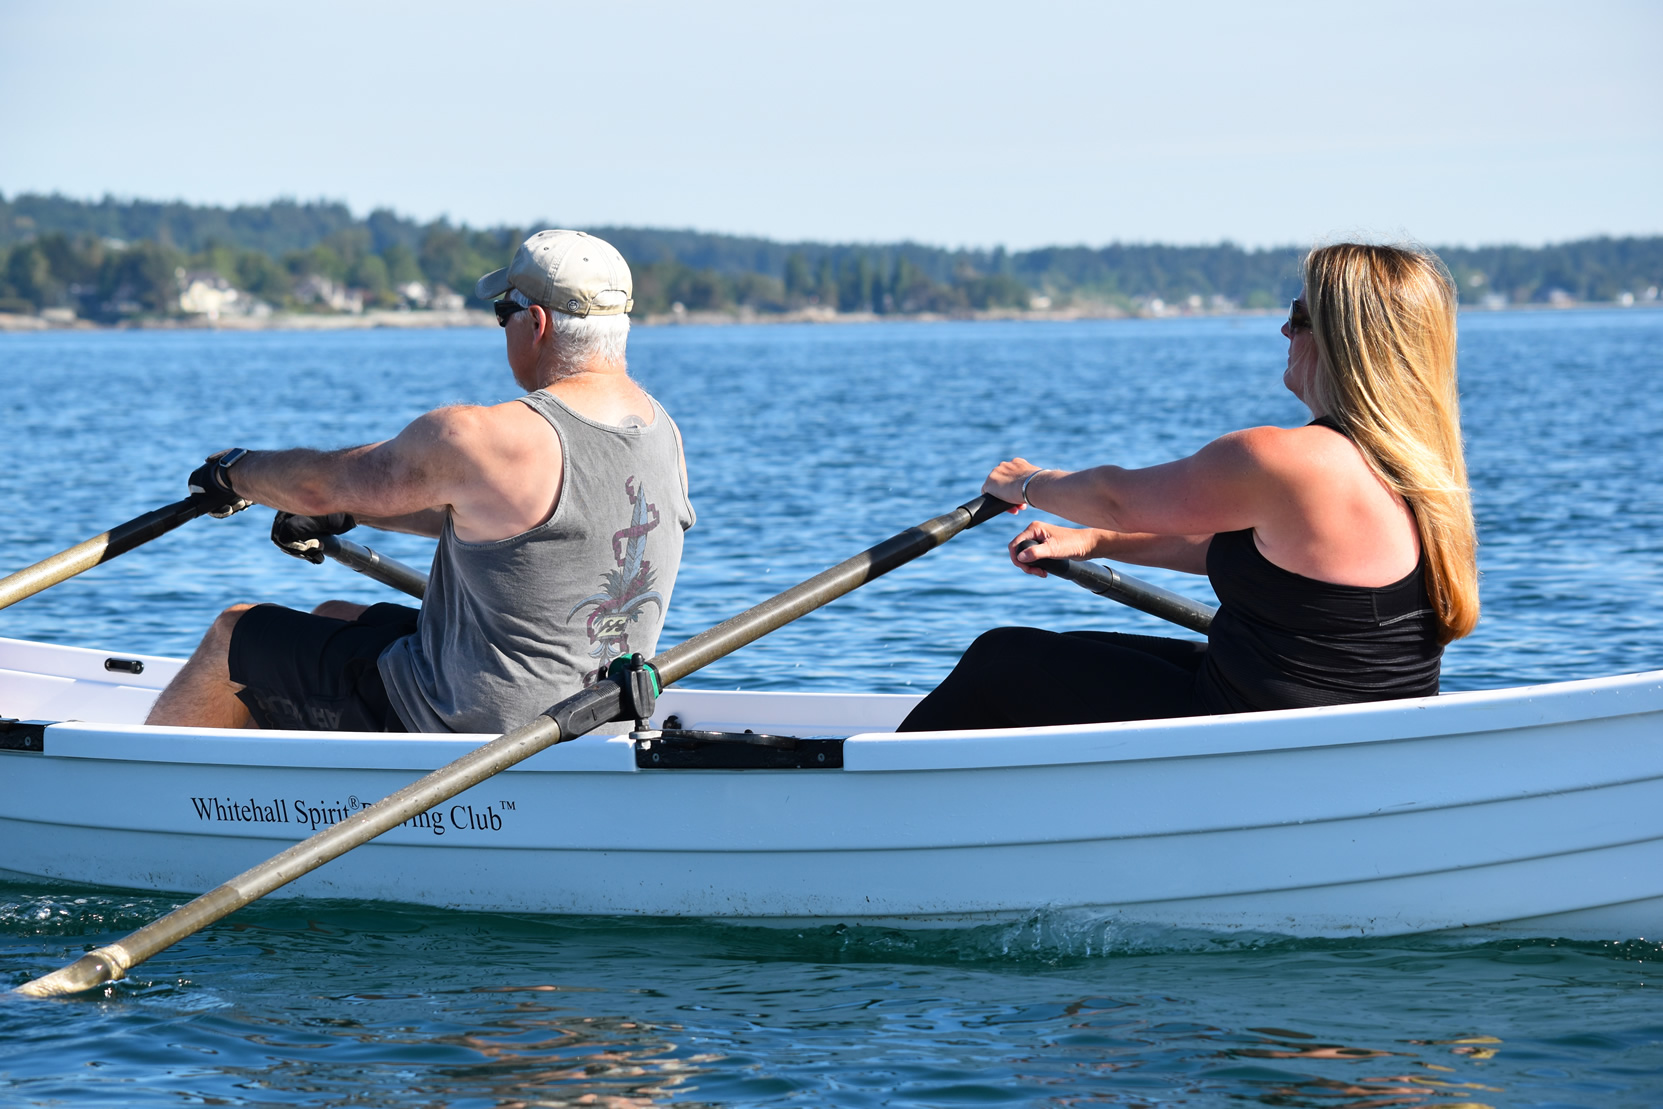 John-and-Di-Oak-Bay-WSRC-Whitehall-Rowing-and-Sail-1663x1109